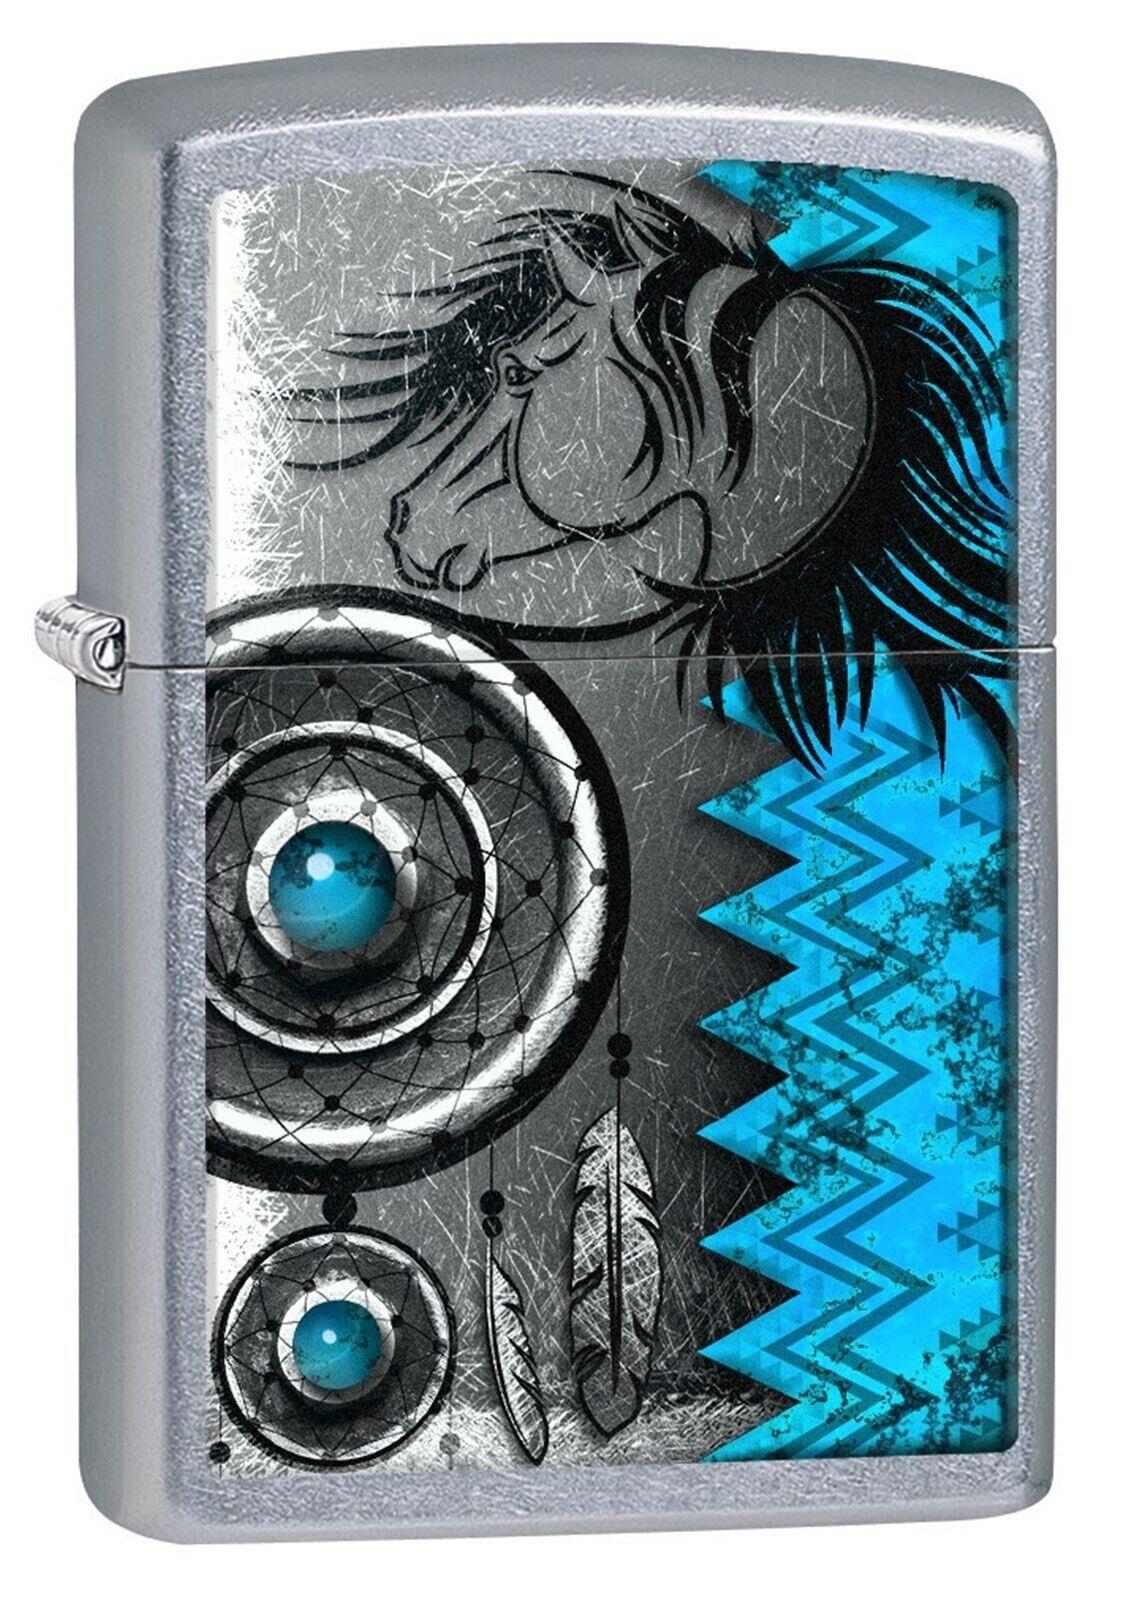 Zippo Lighter: Native American Symbols - Street Chrome 77847